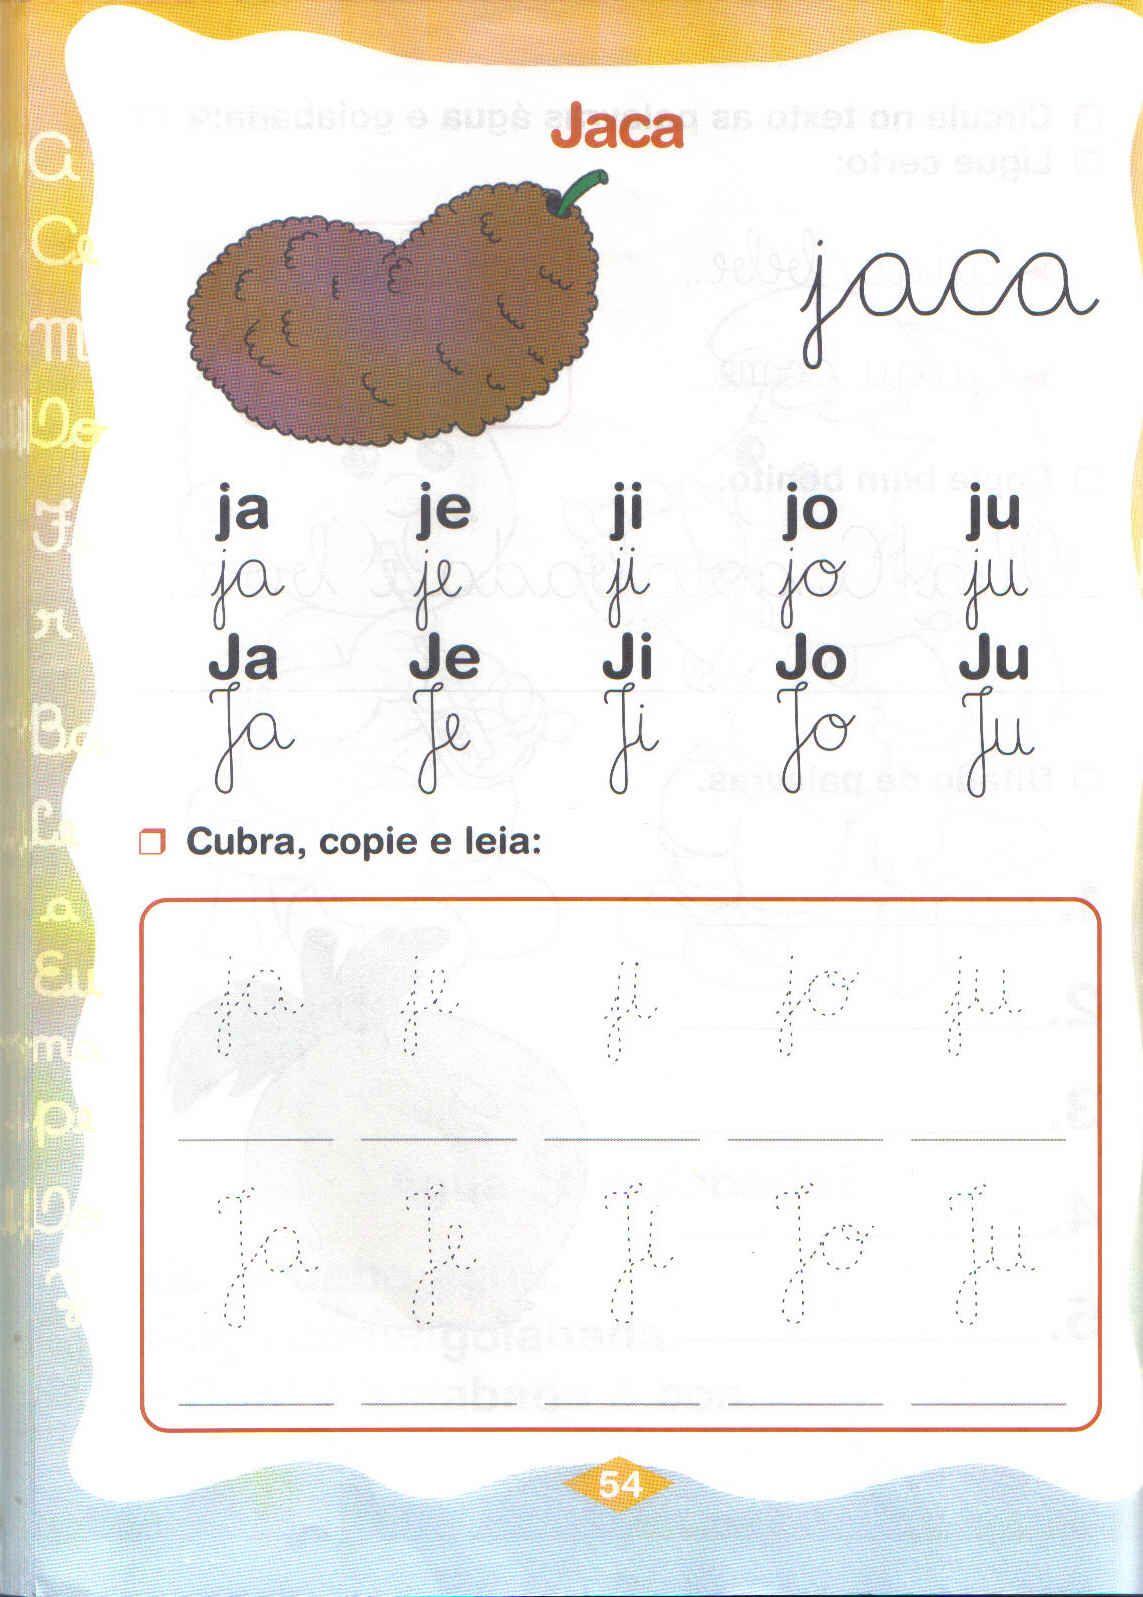 Slabas simples Ja Je Ji Jo Ju  Aprender e Brincar